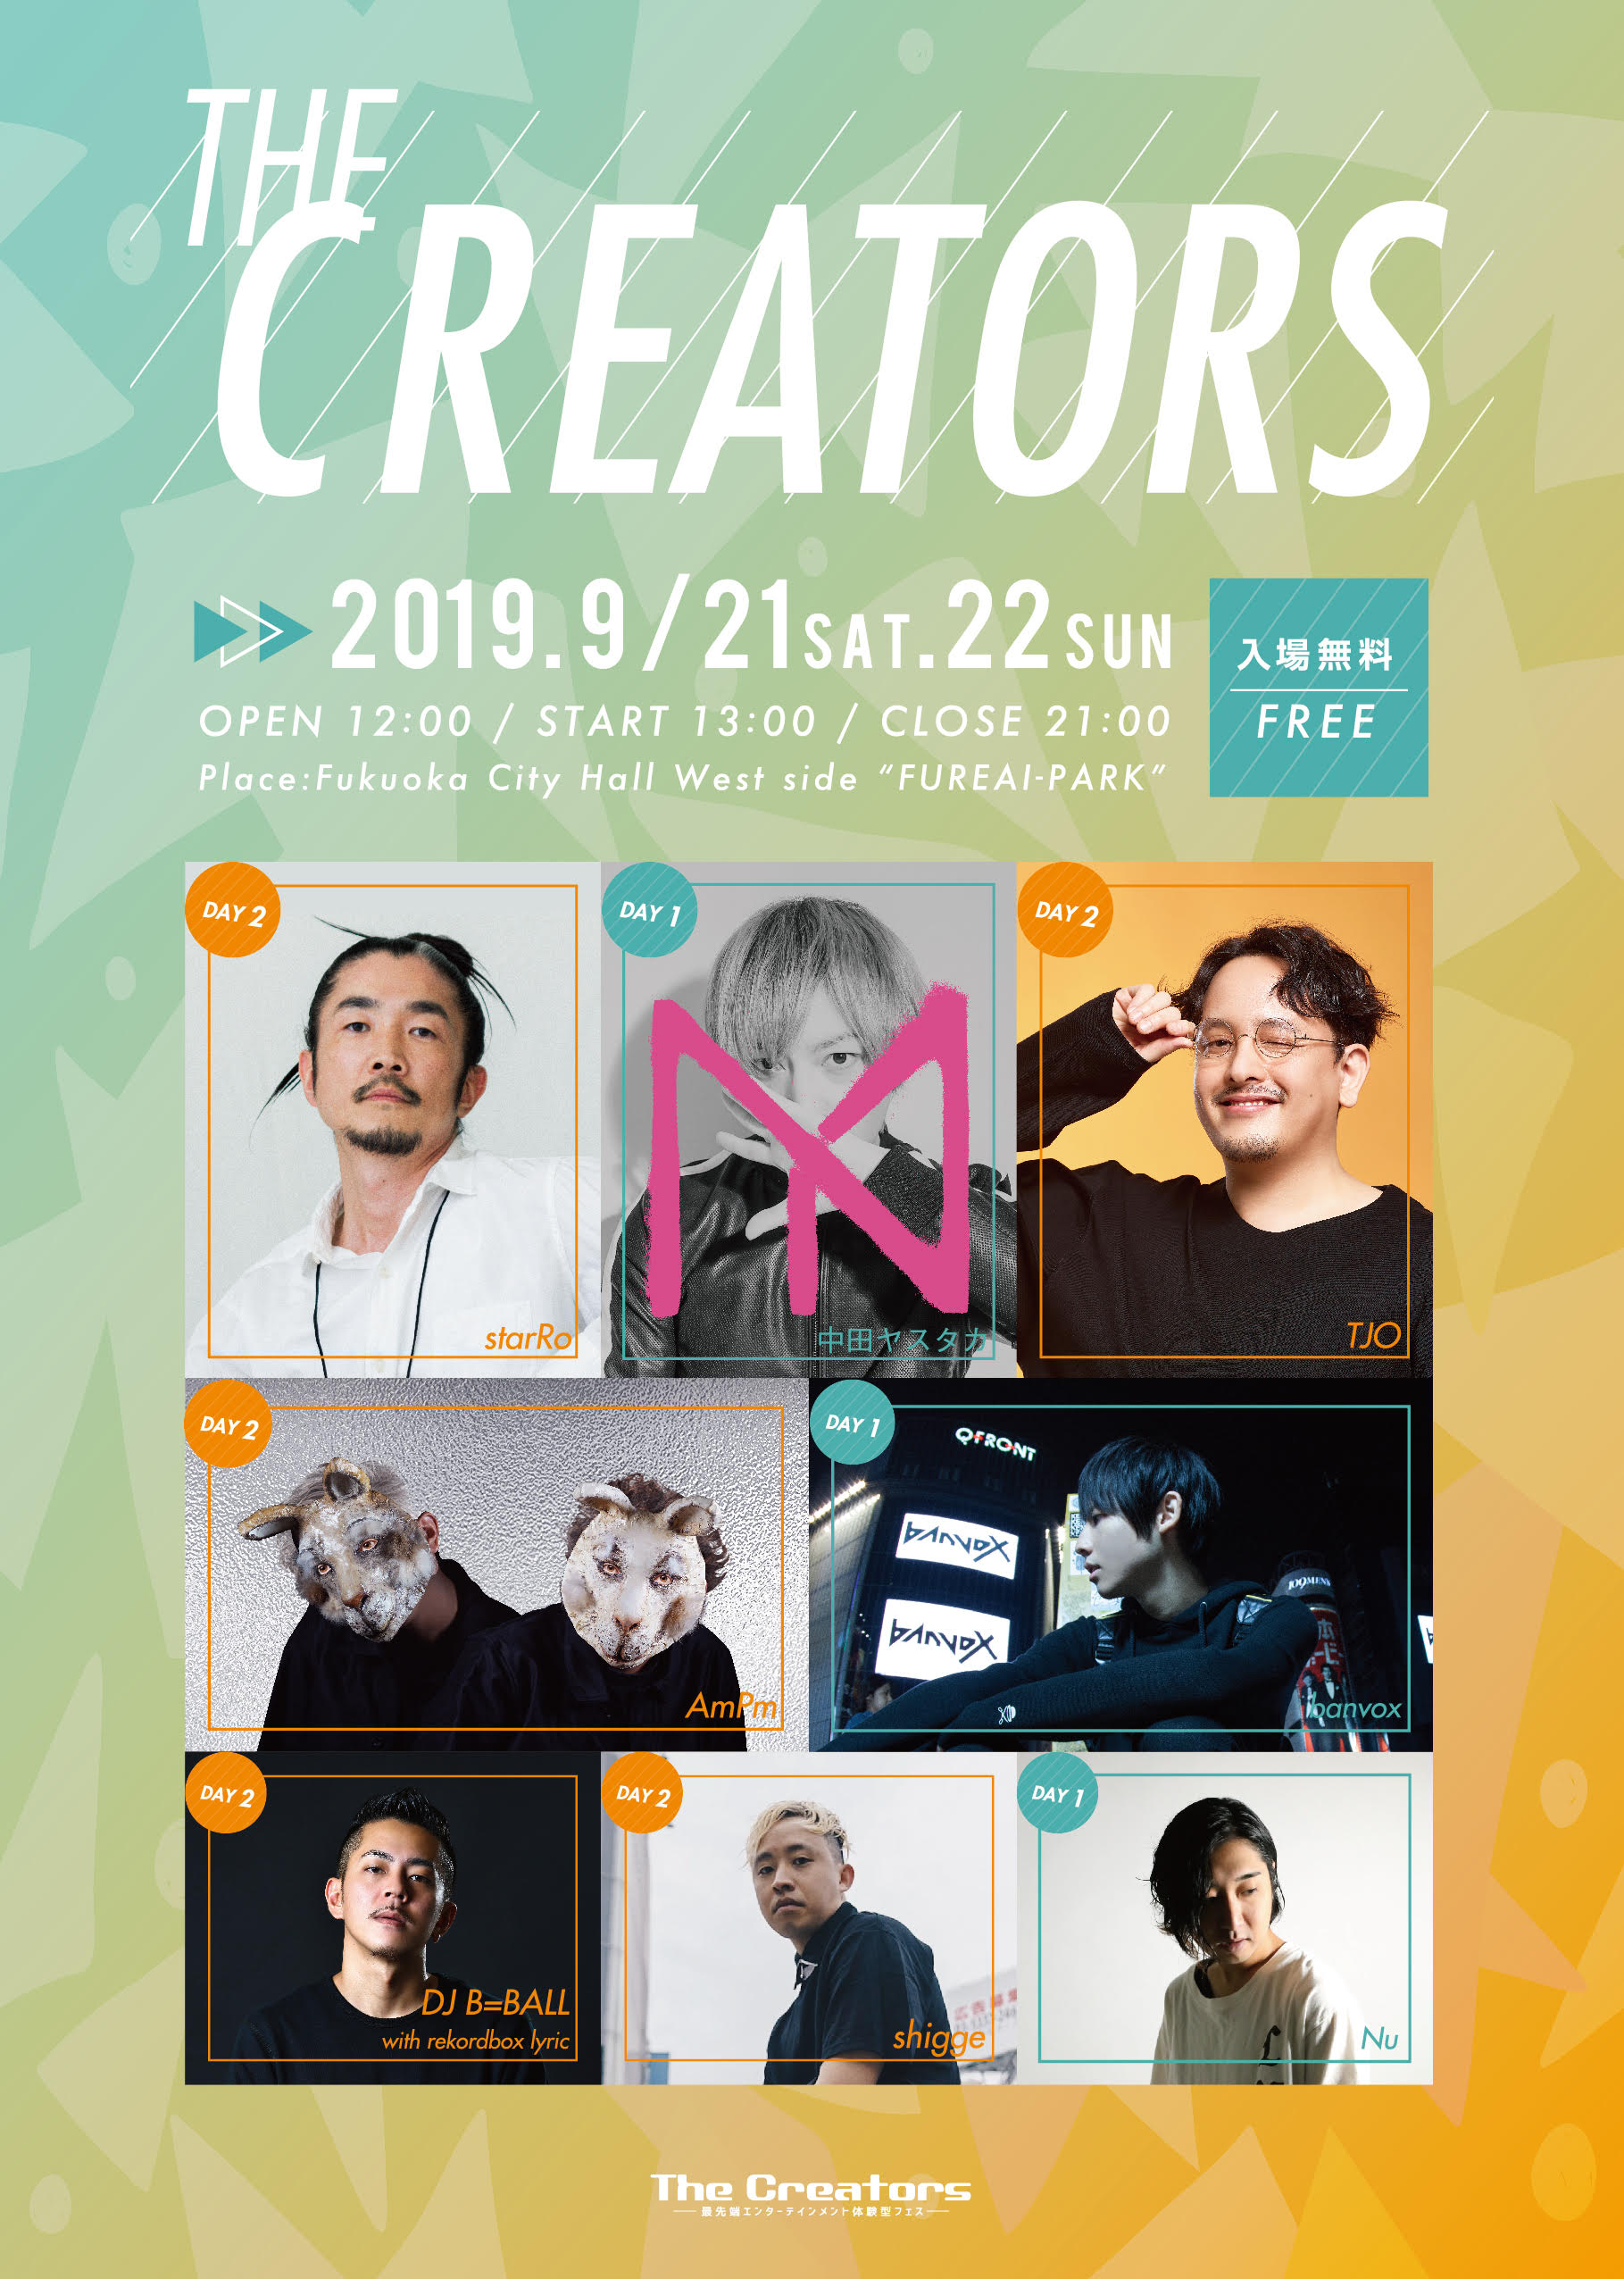 The Creators 2019